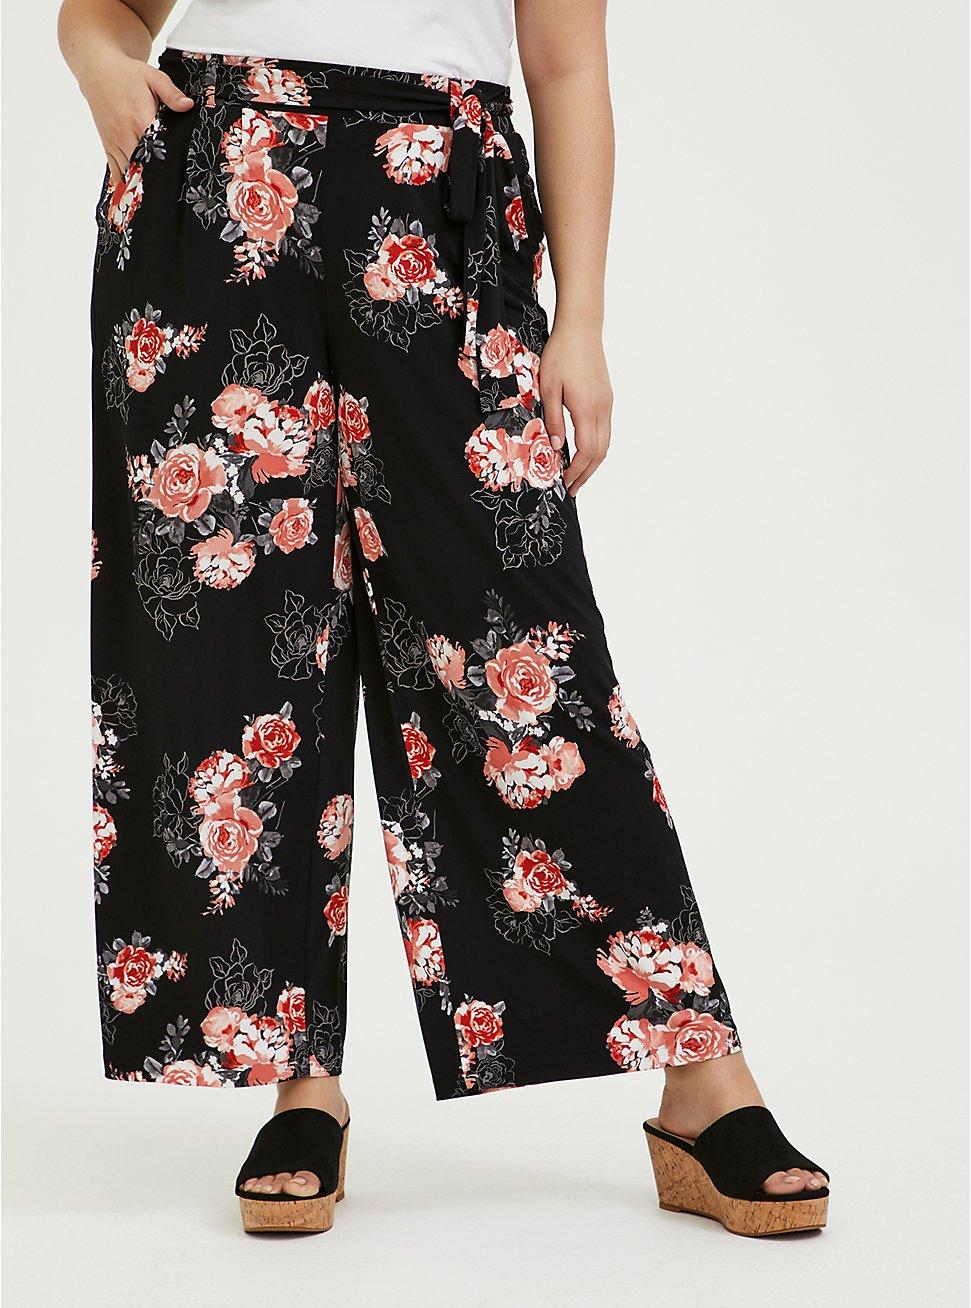 Black Floral Studio Knit Self Tie Wide Leg Pant, FLORAL, hi-res